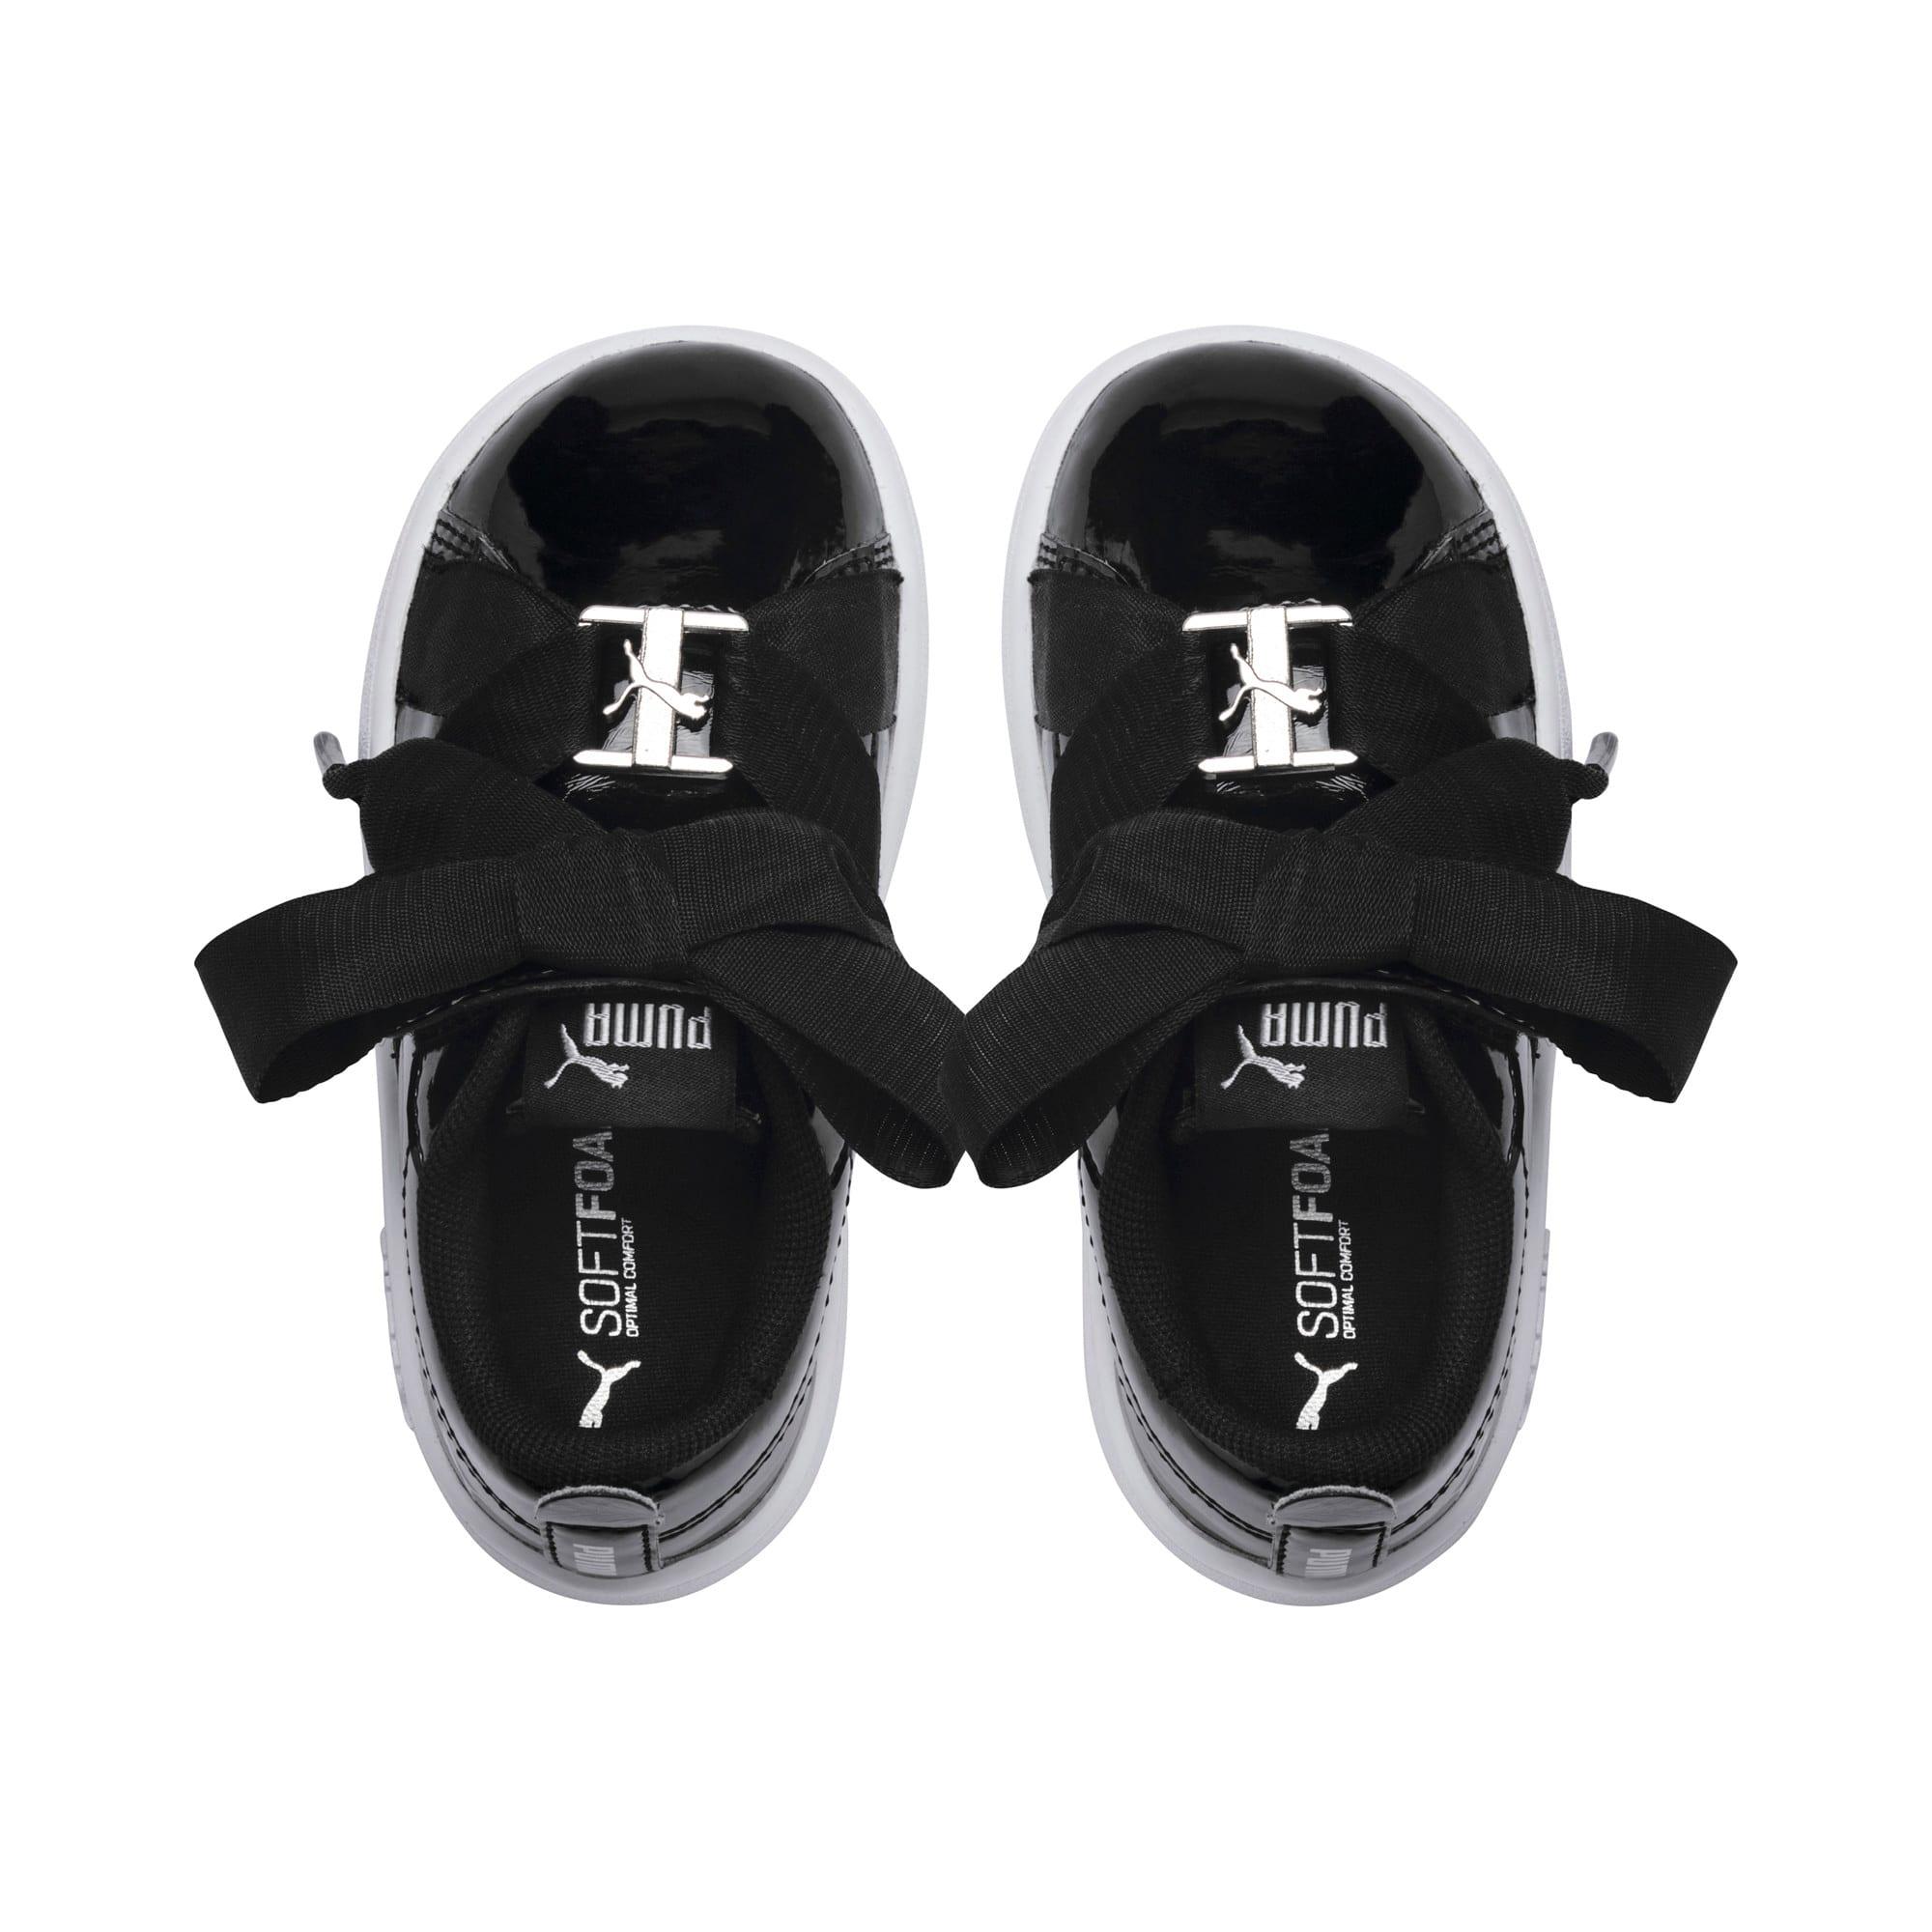 Thumbnail 6 of PUMA Smash v2 Patent Buckle AC Toddler Shoes, Puma Black-Puma Silver-White, medium